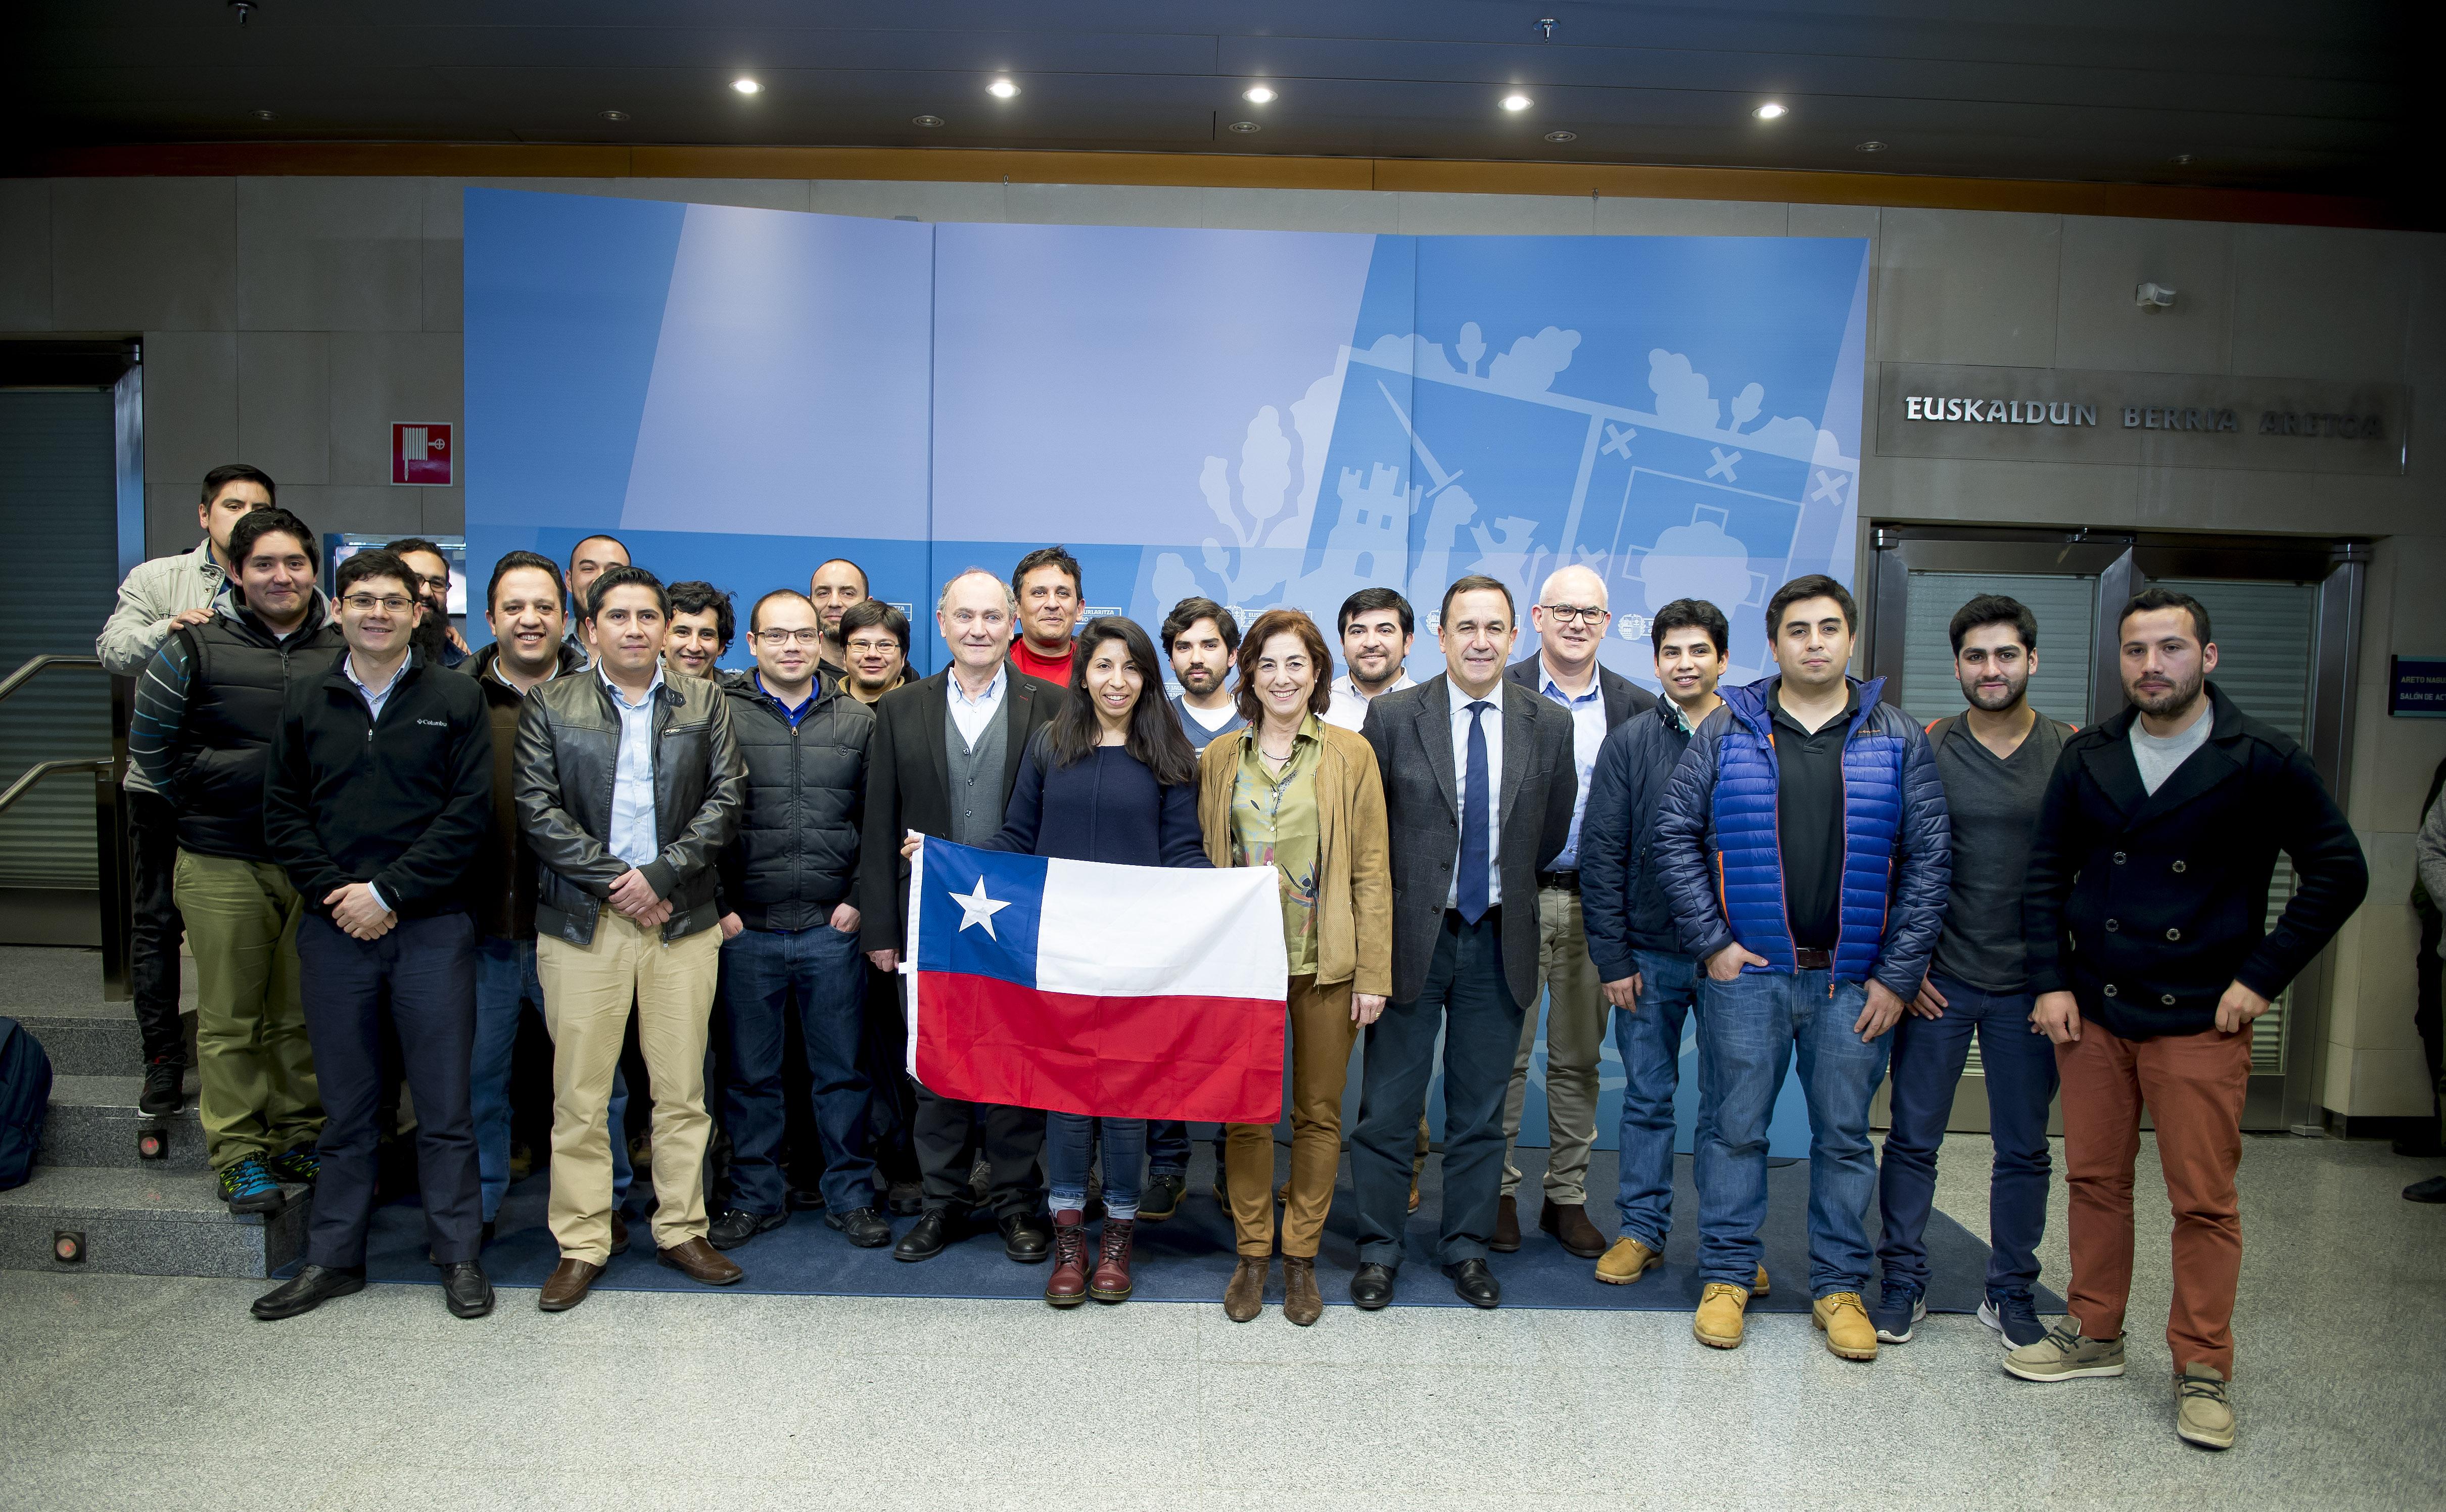 2017_02_20_uriarte_chilenos_fp_05.jpg